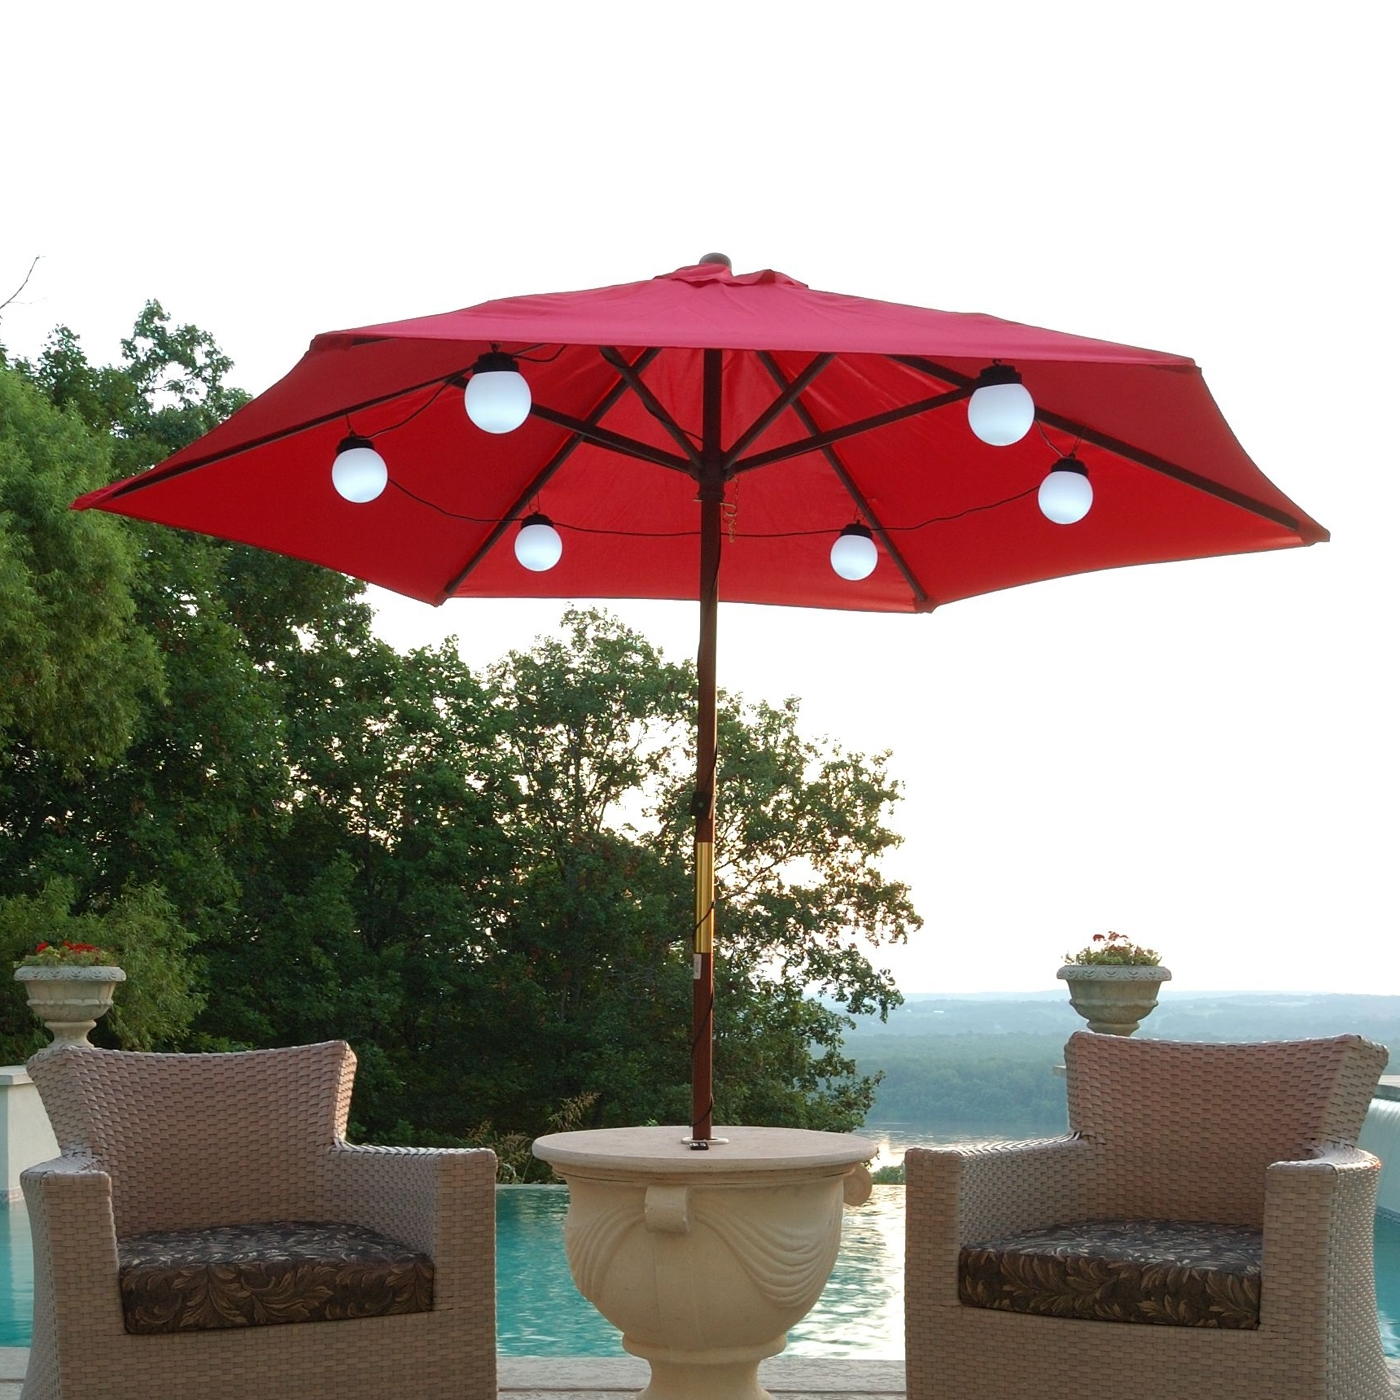 Patio Umbrella Lights Style — Wilson Home Ideas : Beautiful Patio Within 2019 Patio Umbrella Lights (View 13 of 20)